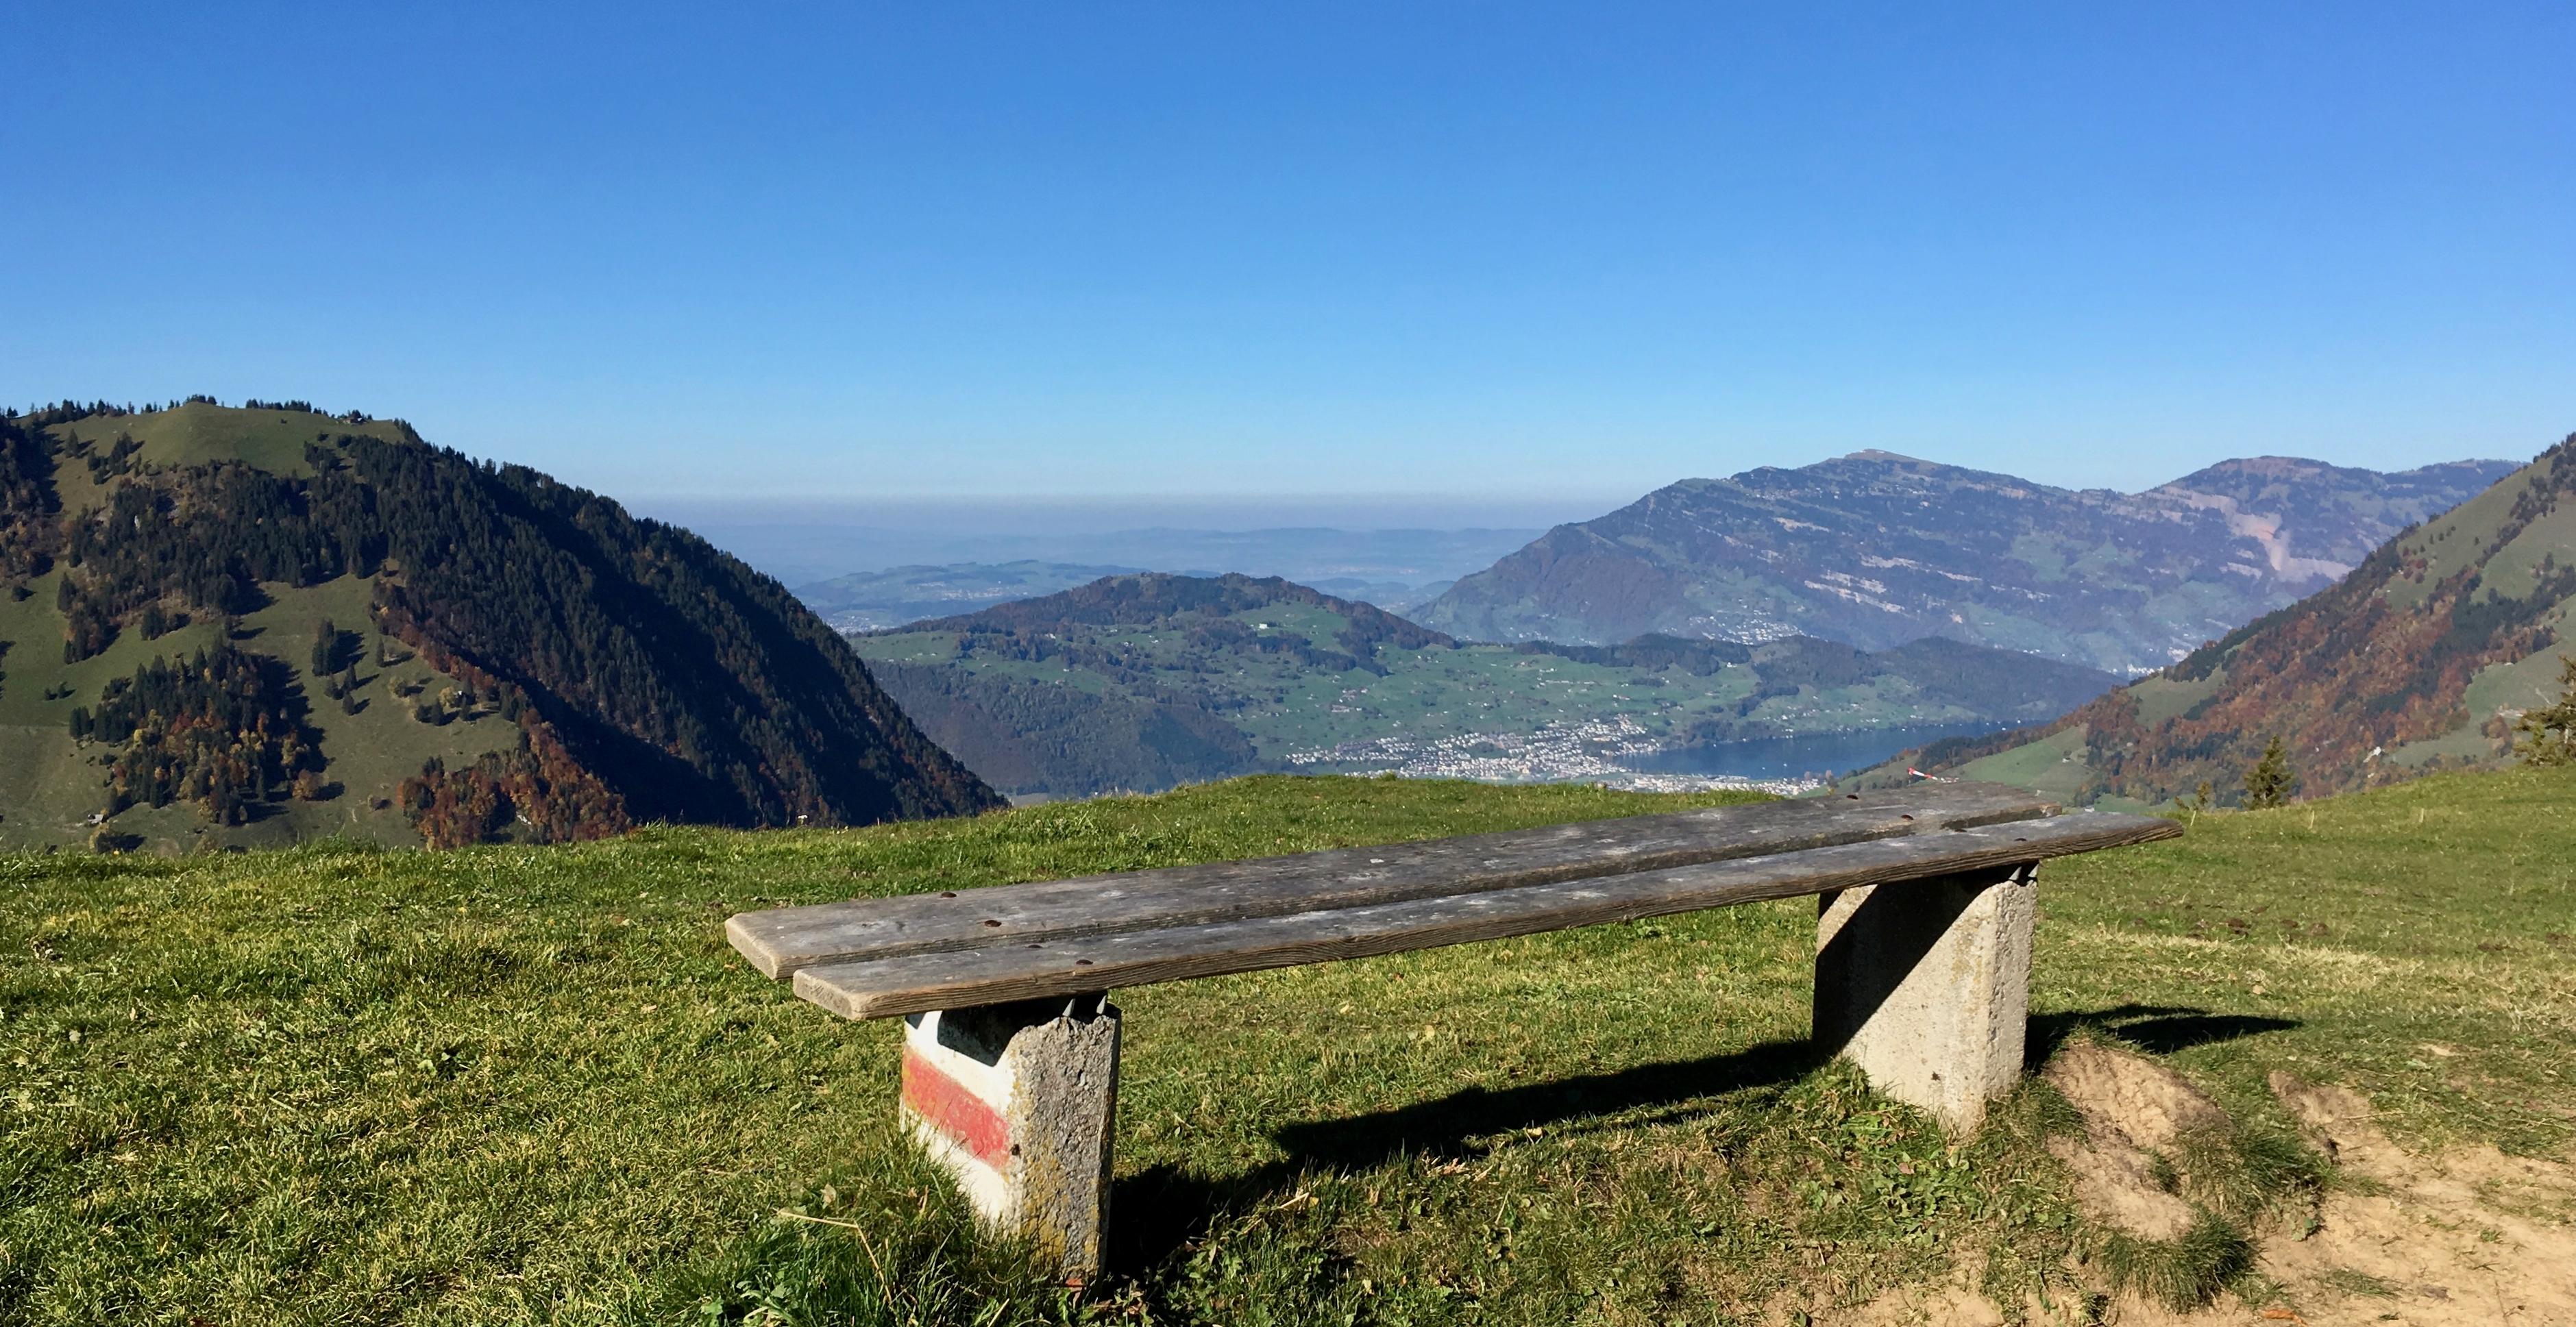 Sitzubank Berg Innerschweiz 2017.jpg